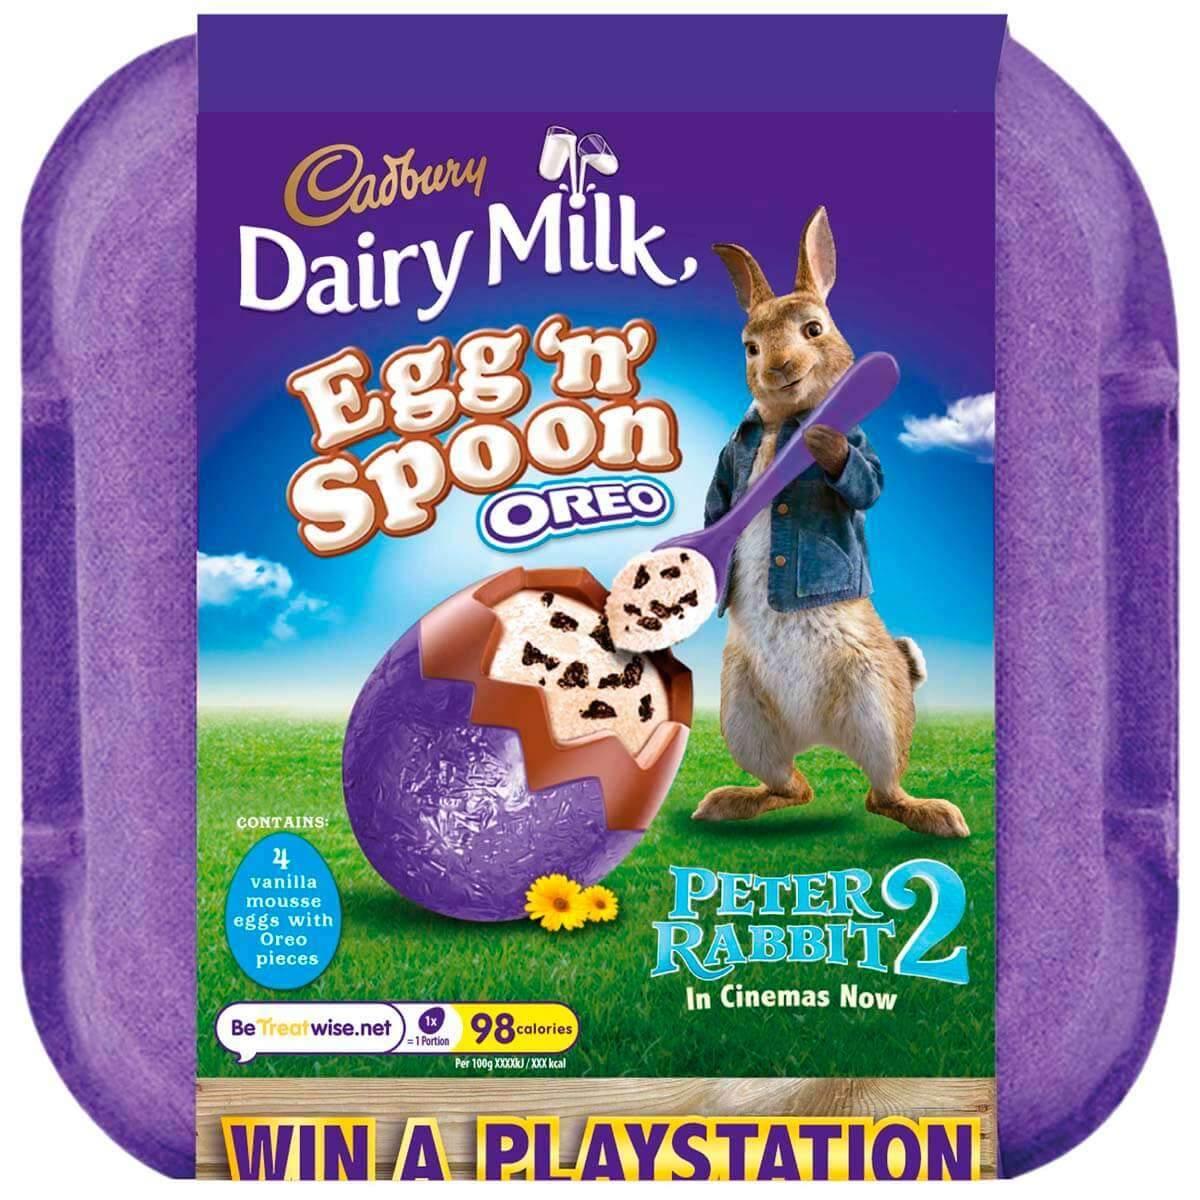 Dairy Milk Egg 'n' Spoon Oreo Box of 8